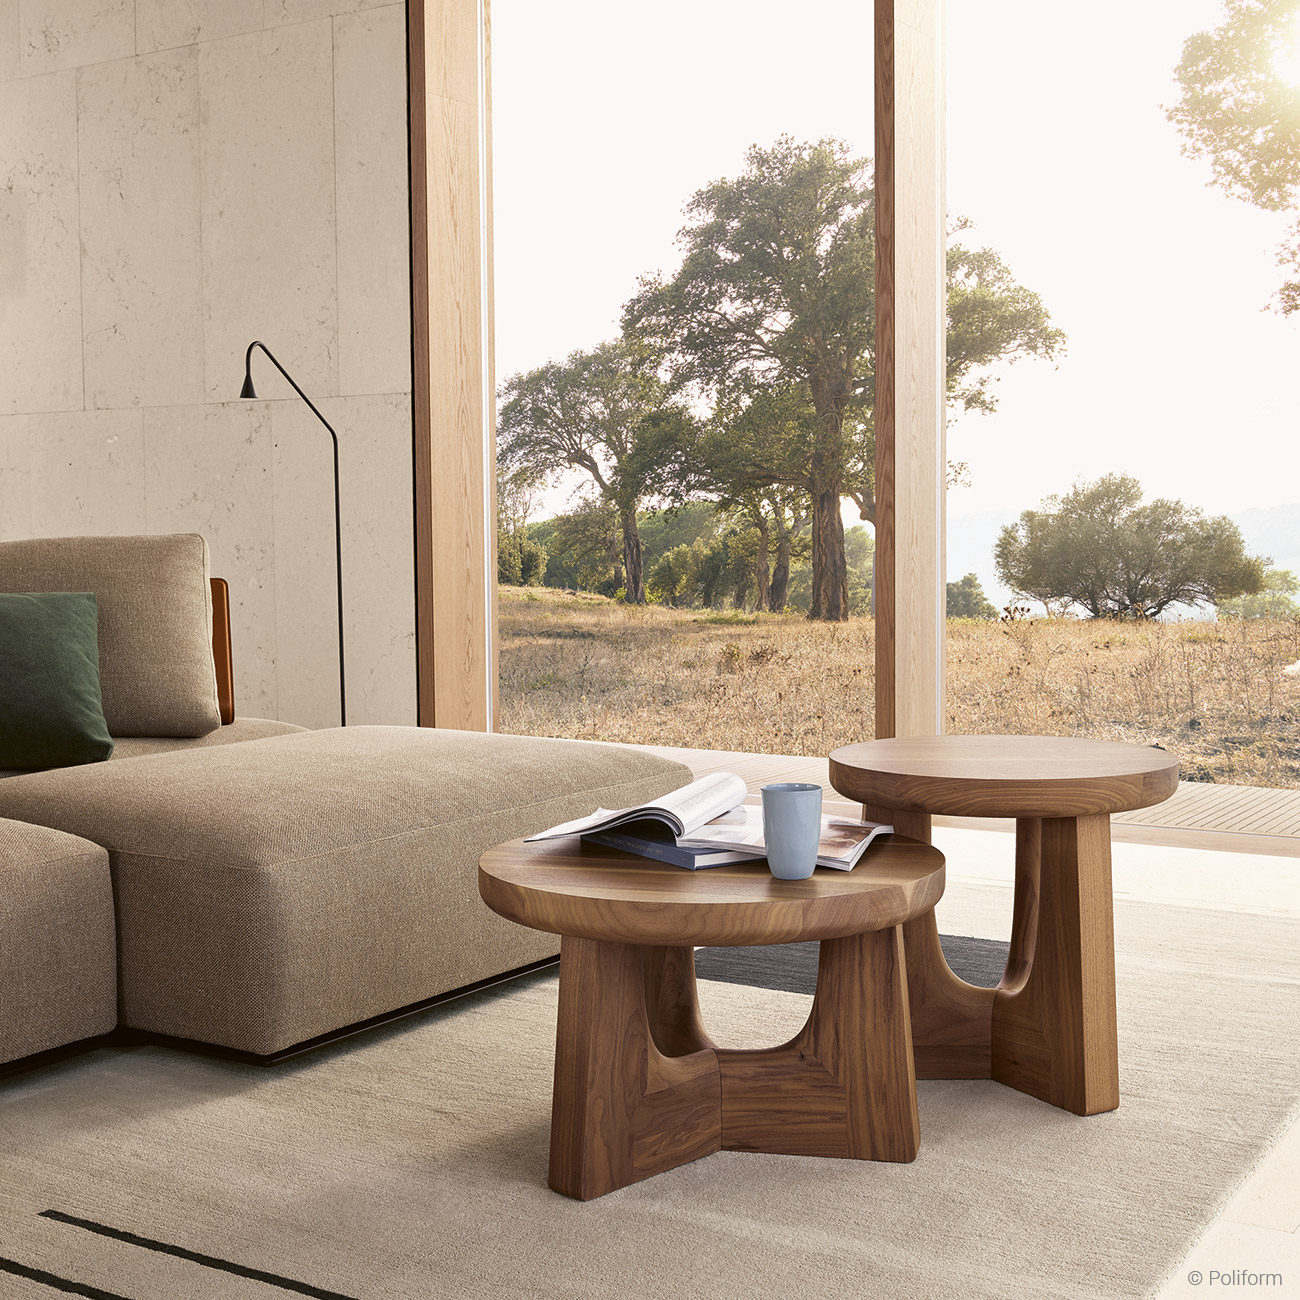 Minimal luxury living room interior by Poliform